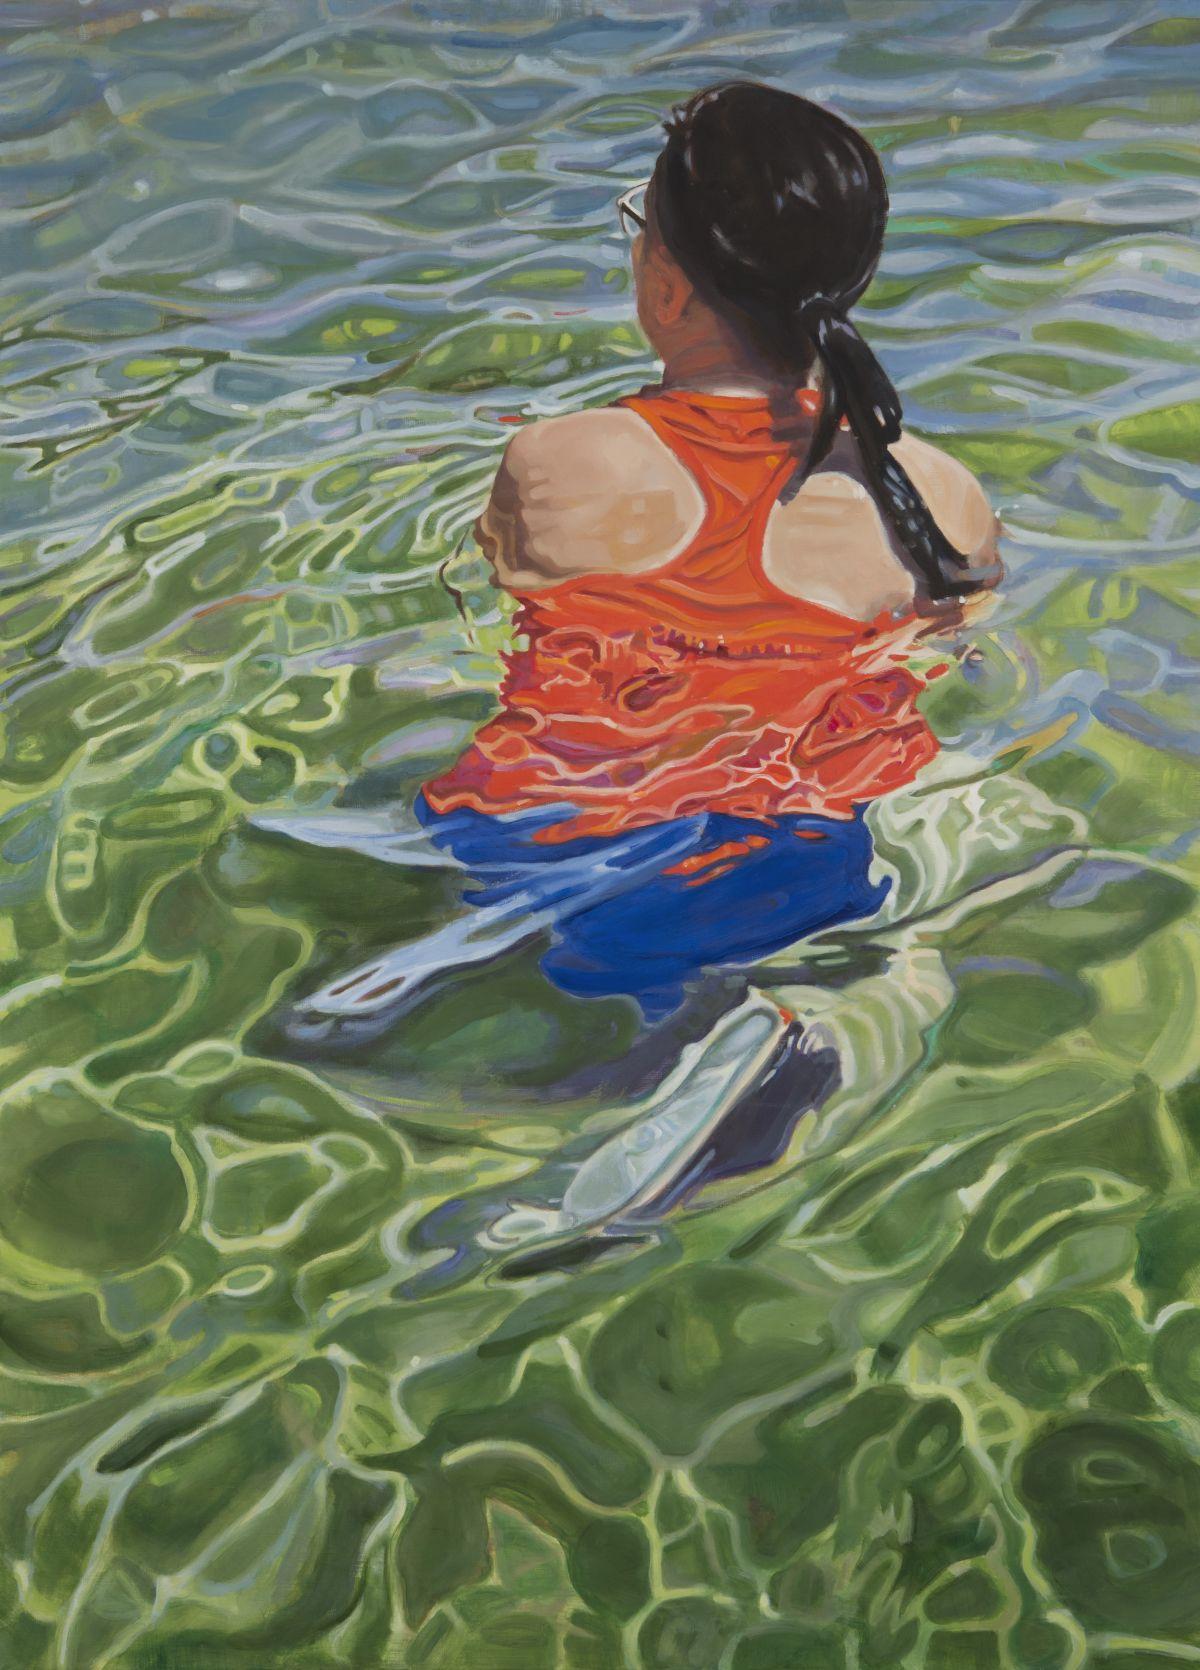 Painter Claudia Waters to show in Hunterdon Art Museum members exhibition